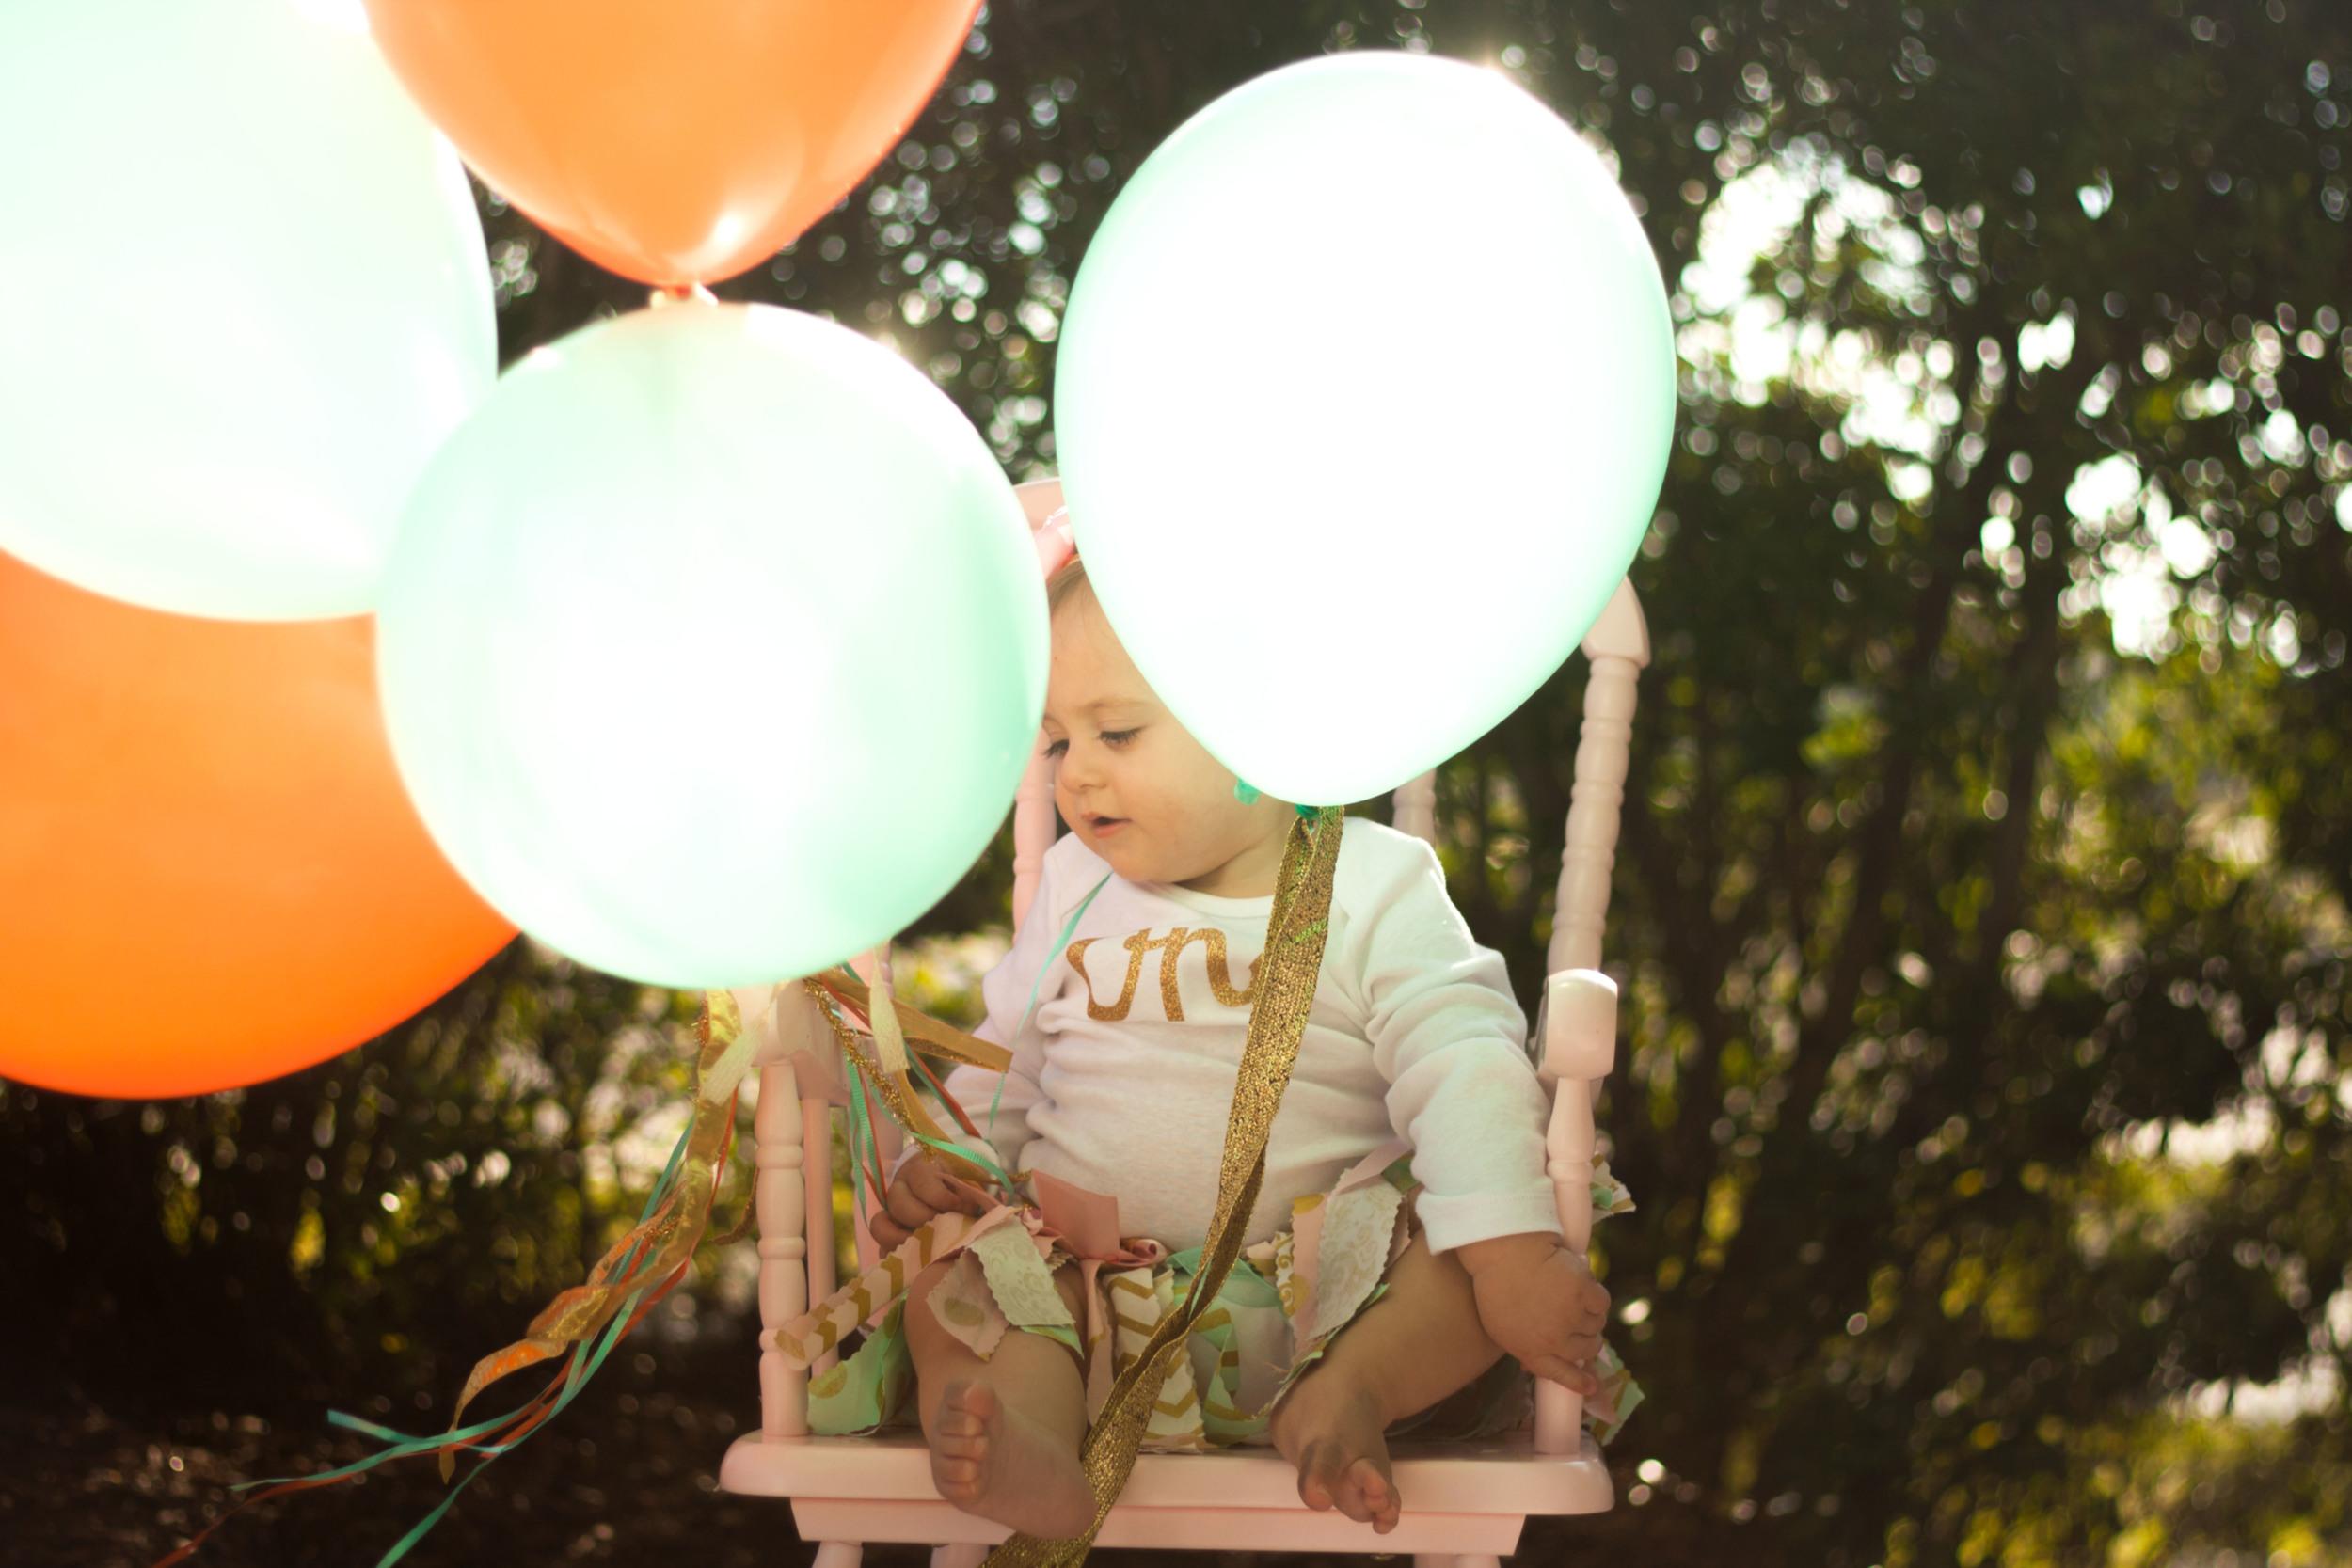 Wilmington_NC_1st_birthday_tiffany_abruzzo_photography